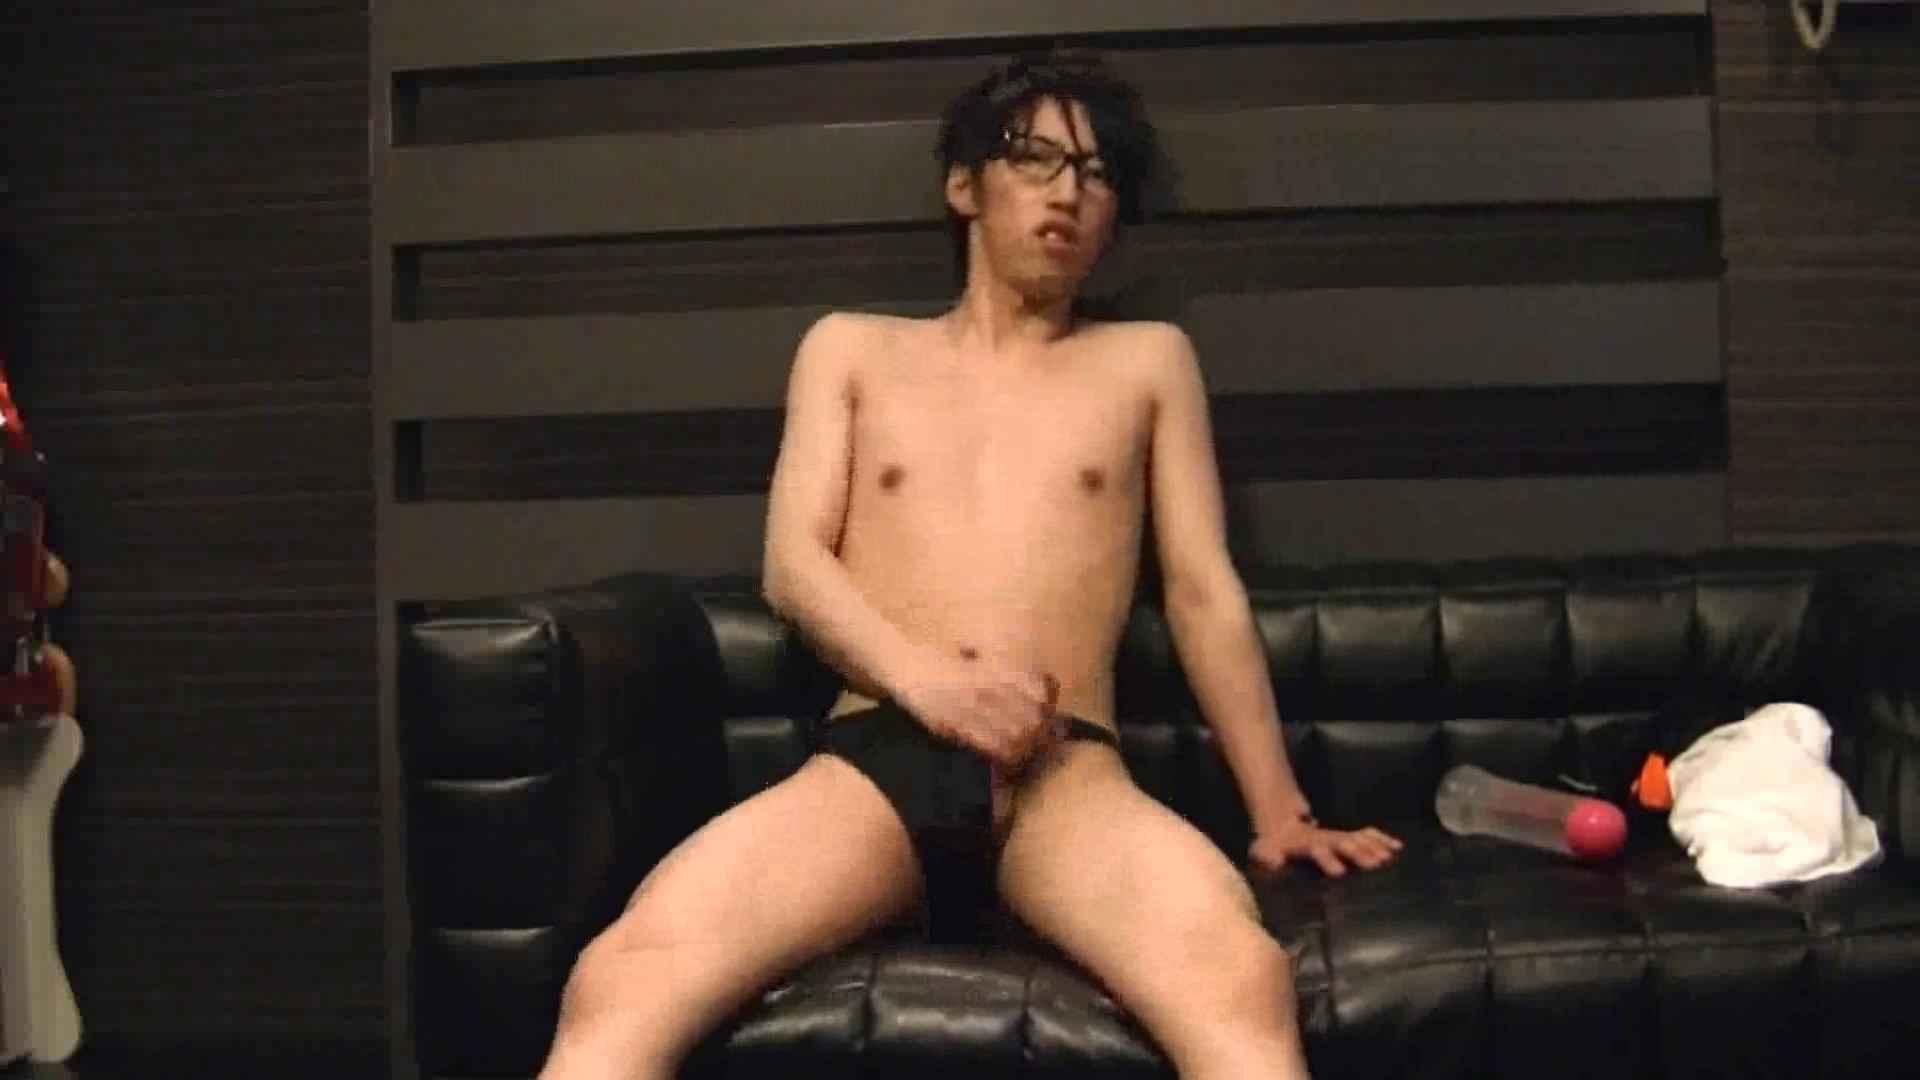 ONA見せカーニバル!! Vol3 男  93pic 61